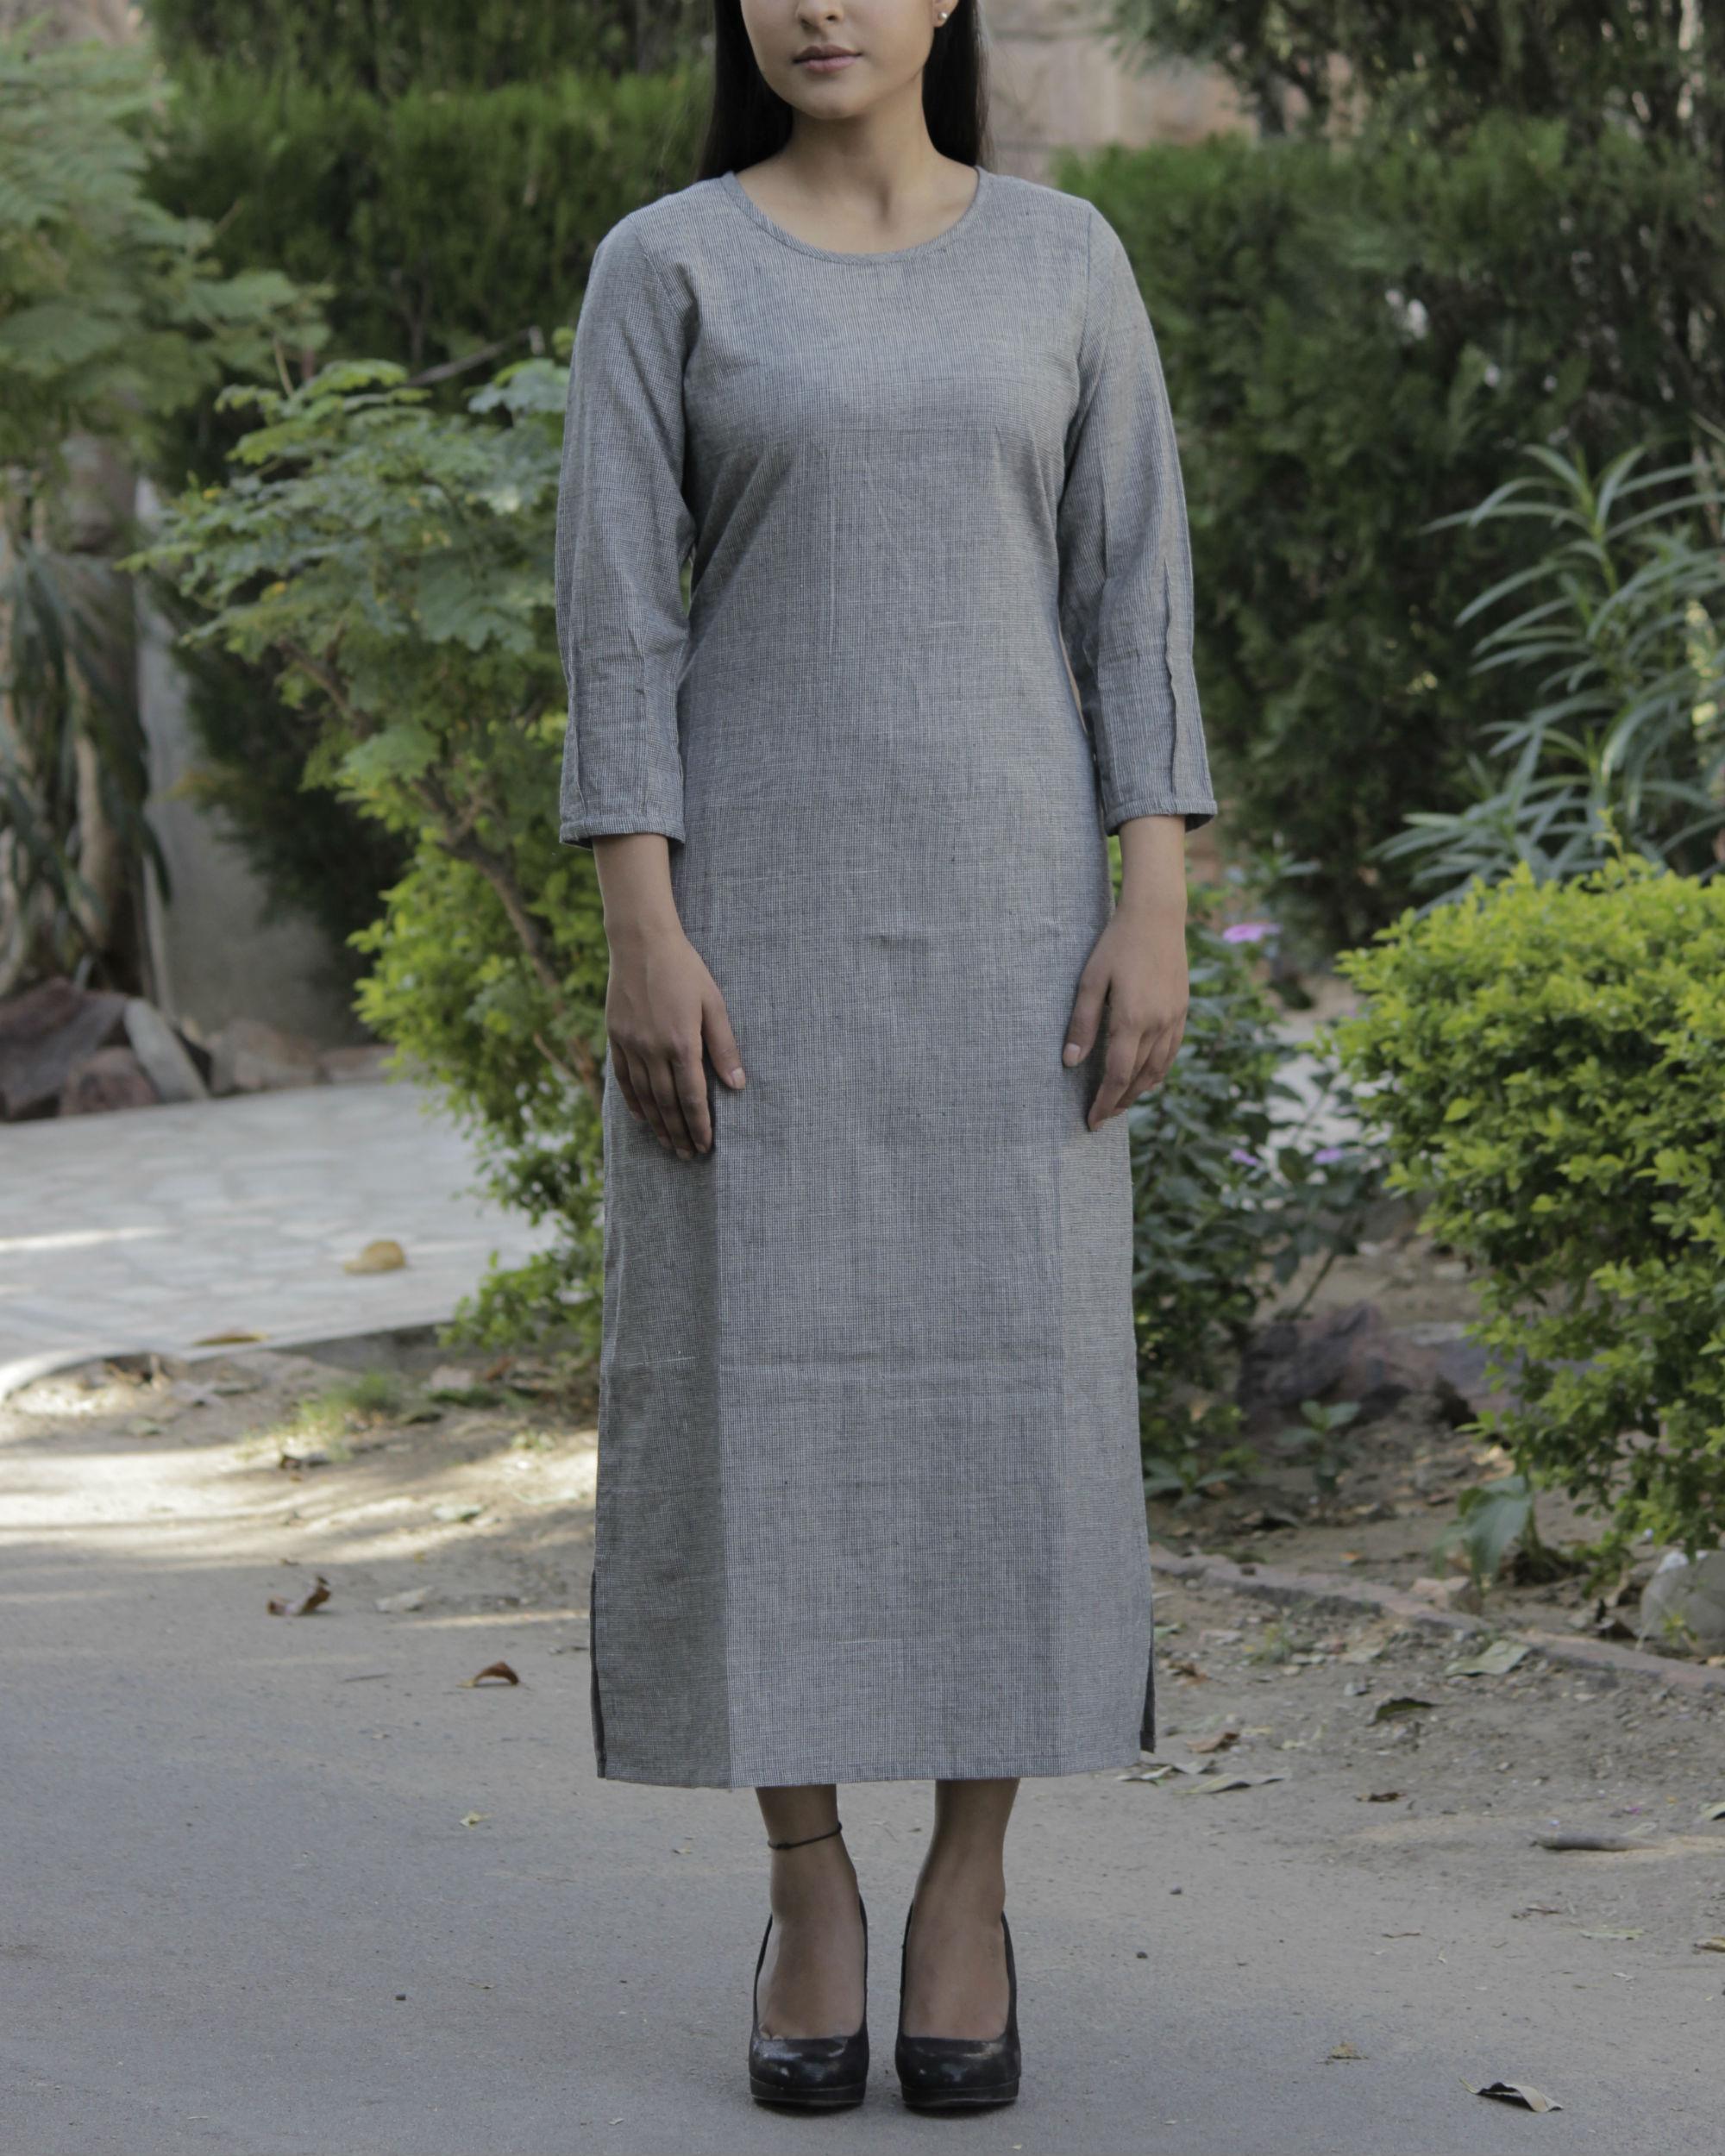 Grey parallel dress